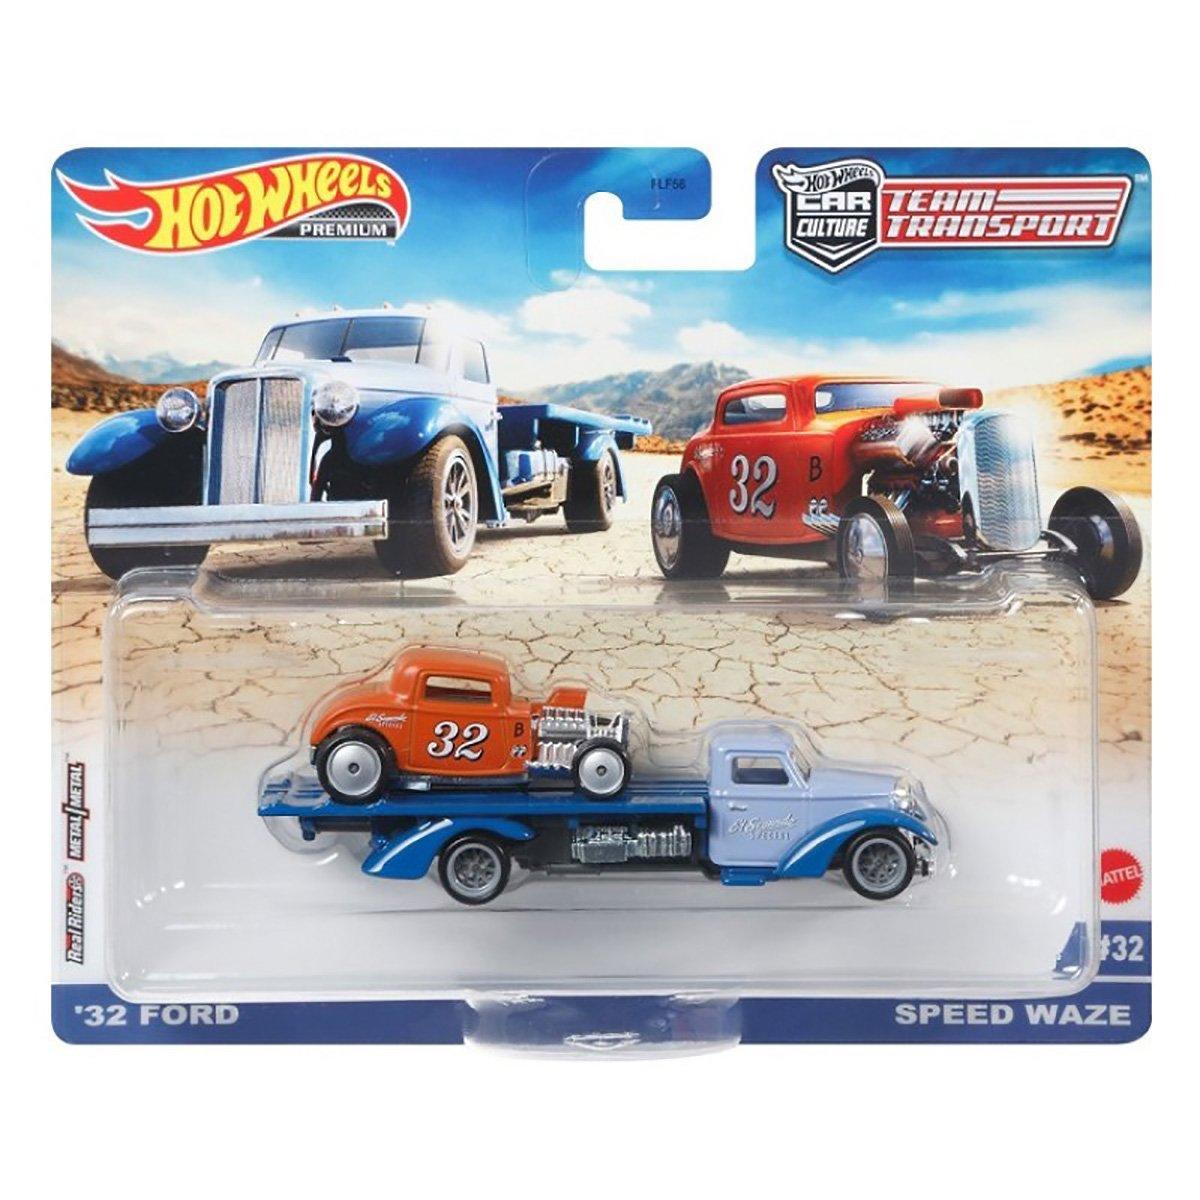 Transportator cu masinuta Hot Wheels, Ford, Speed Waze, GRK53